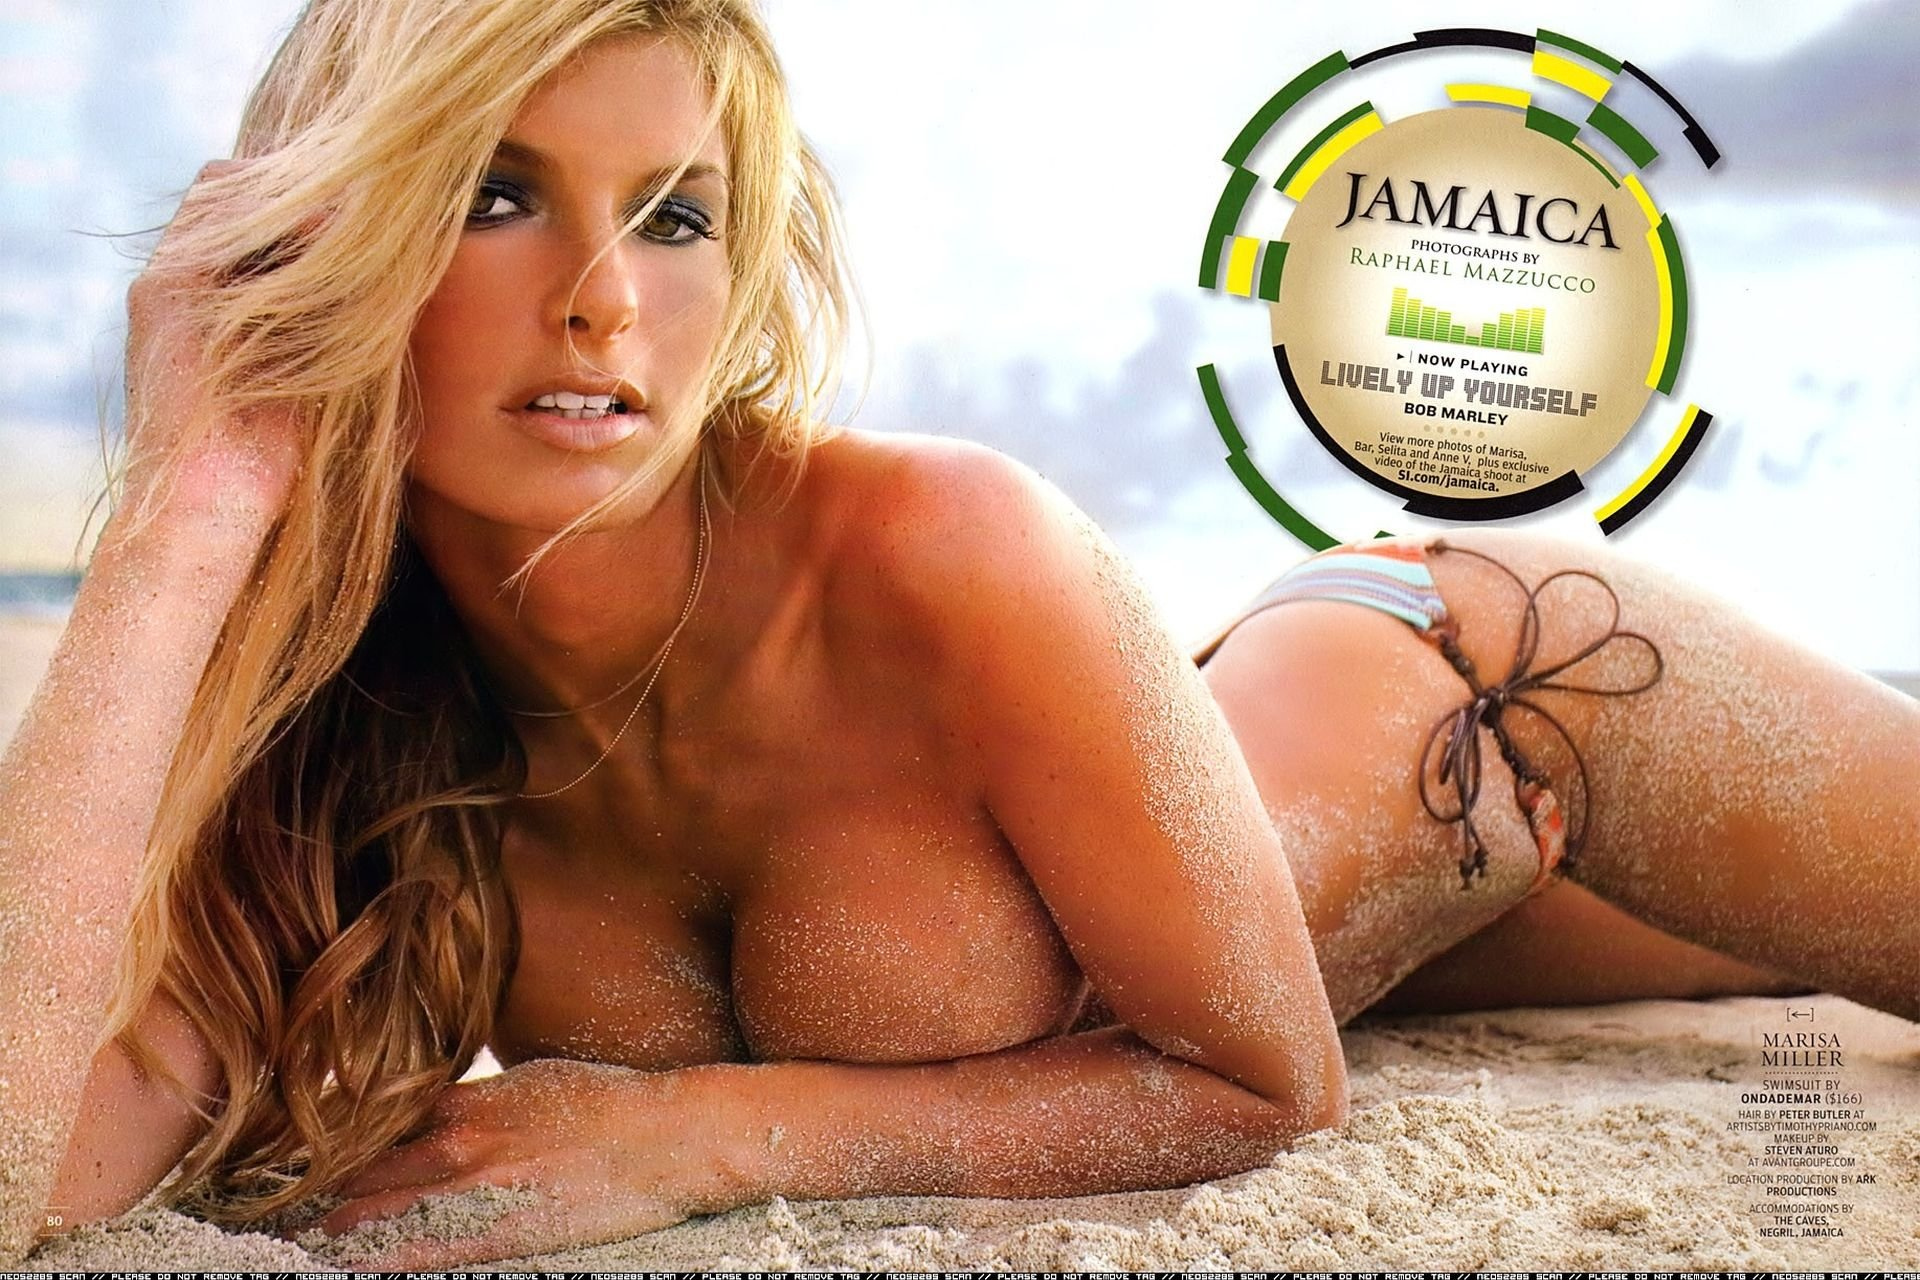 Joanna krupa fully nude posing with body paint